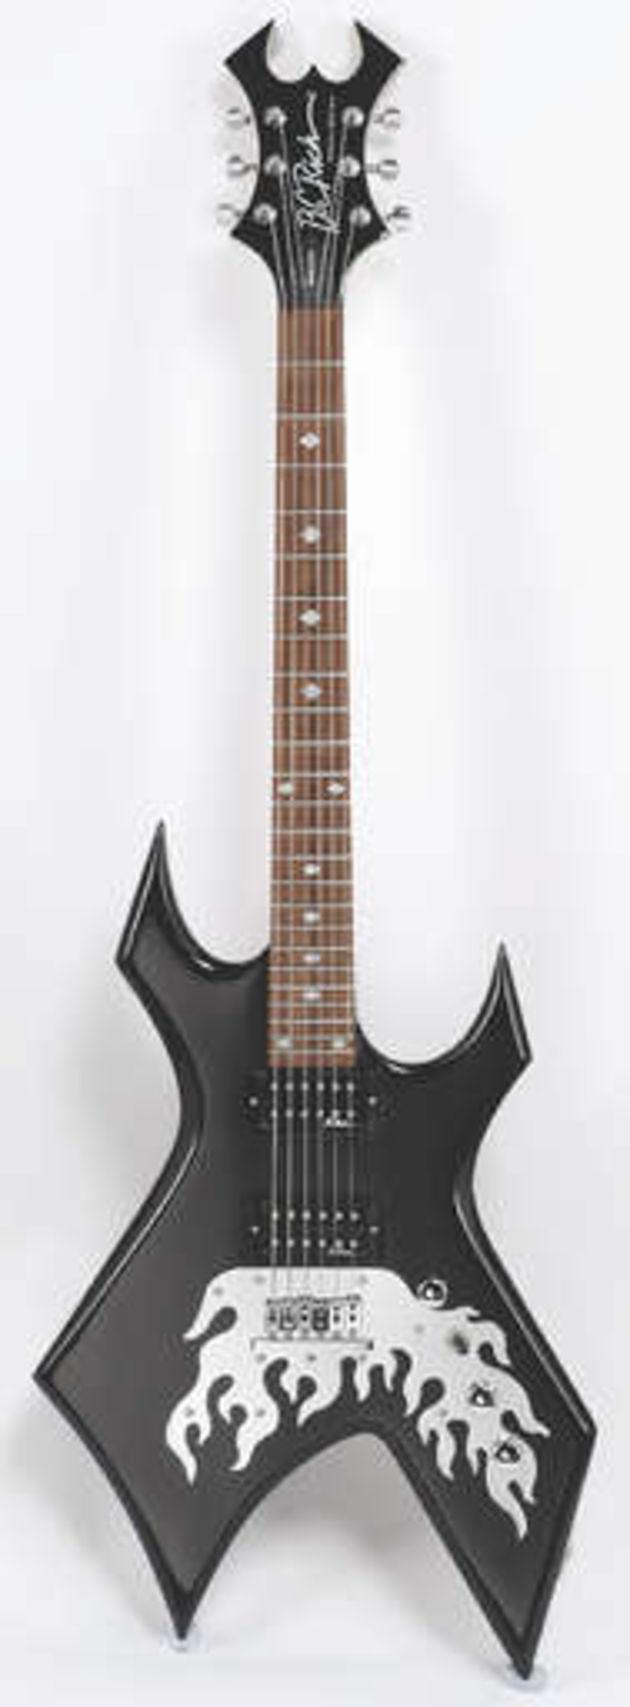 bc rich afterburner warlock guitar reviews musicradar. Black Bedroom Furniture Sets. Home Design Ideas